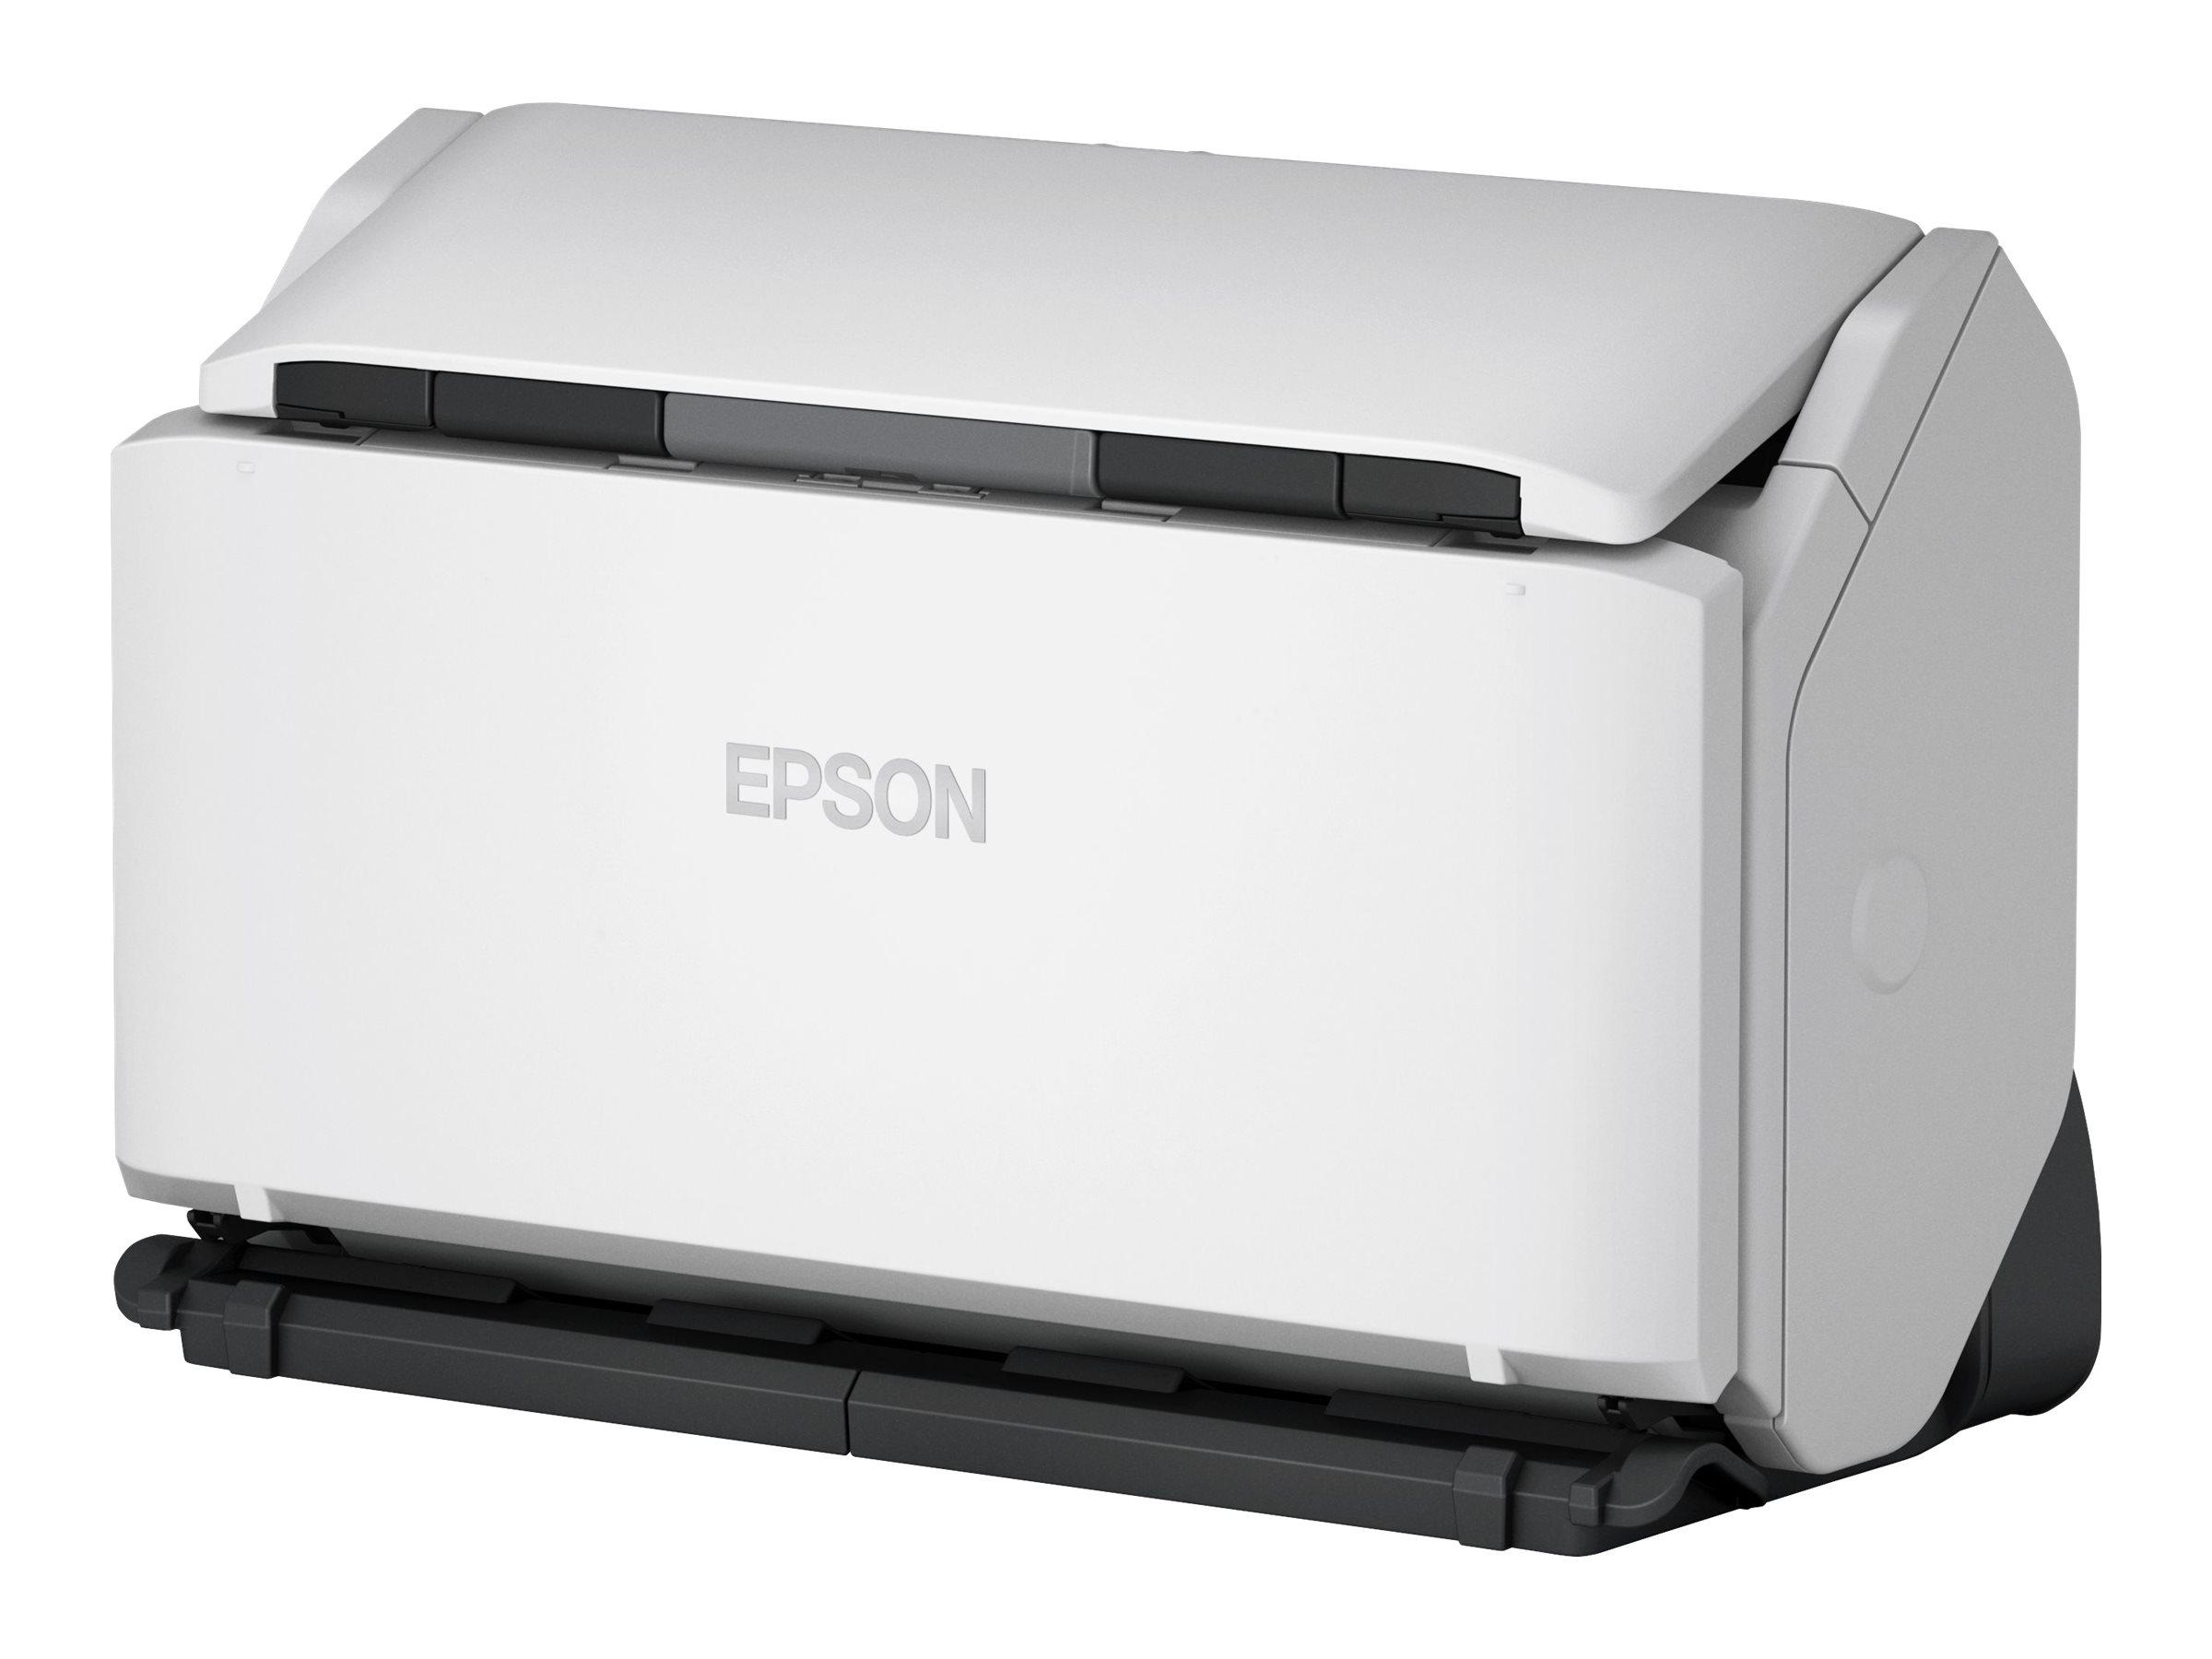 Epson DS-32000 - document scanner - USB 3.0